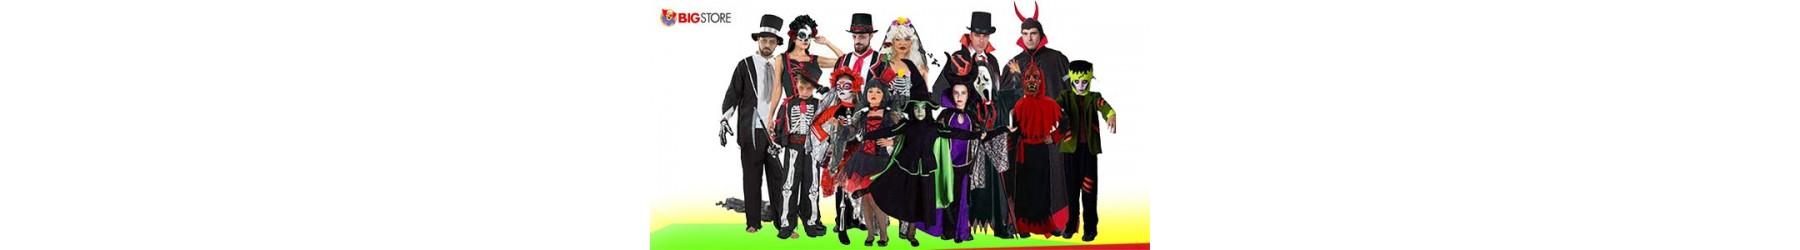 Halloween - Αποκριάτικες στολές και Αξεσουάρ - Day of Dead